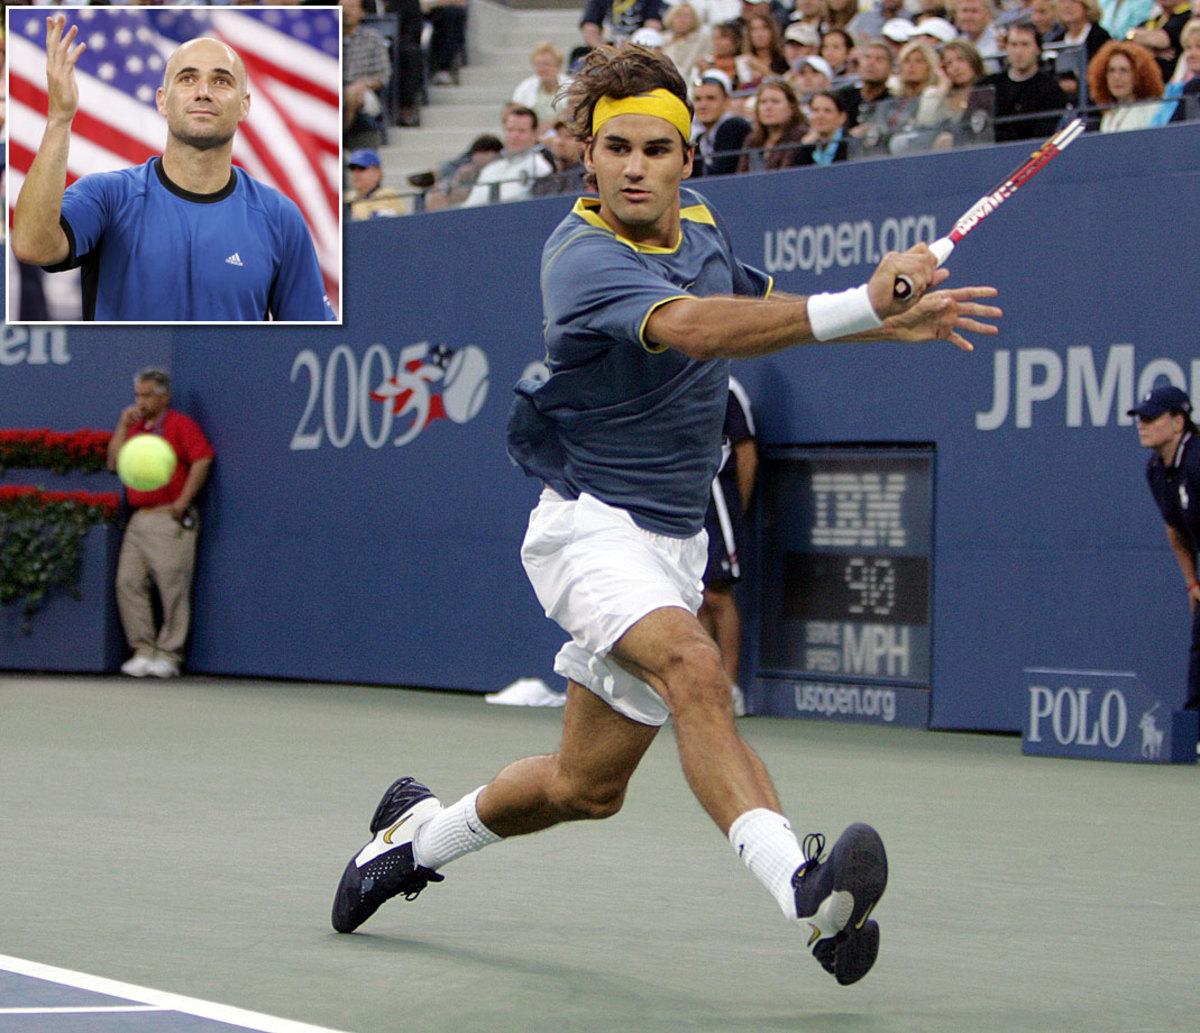 Roger-Federer-2005-US-Open-Andre-Agassi.jpg